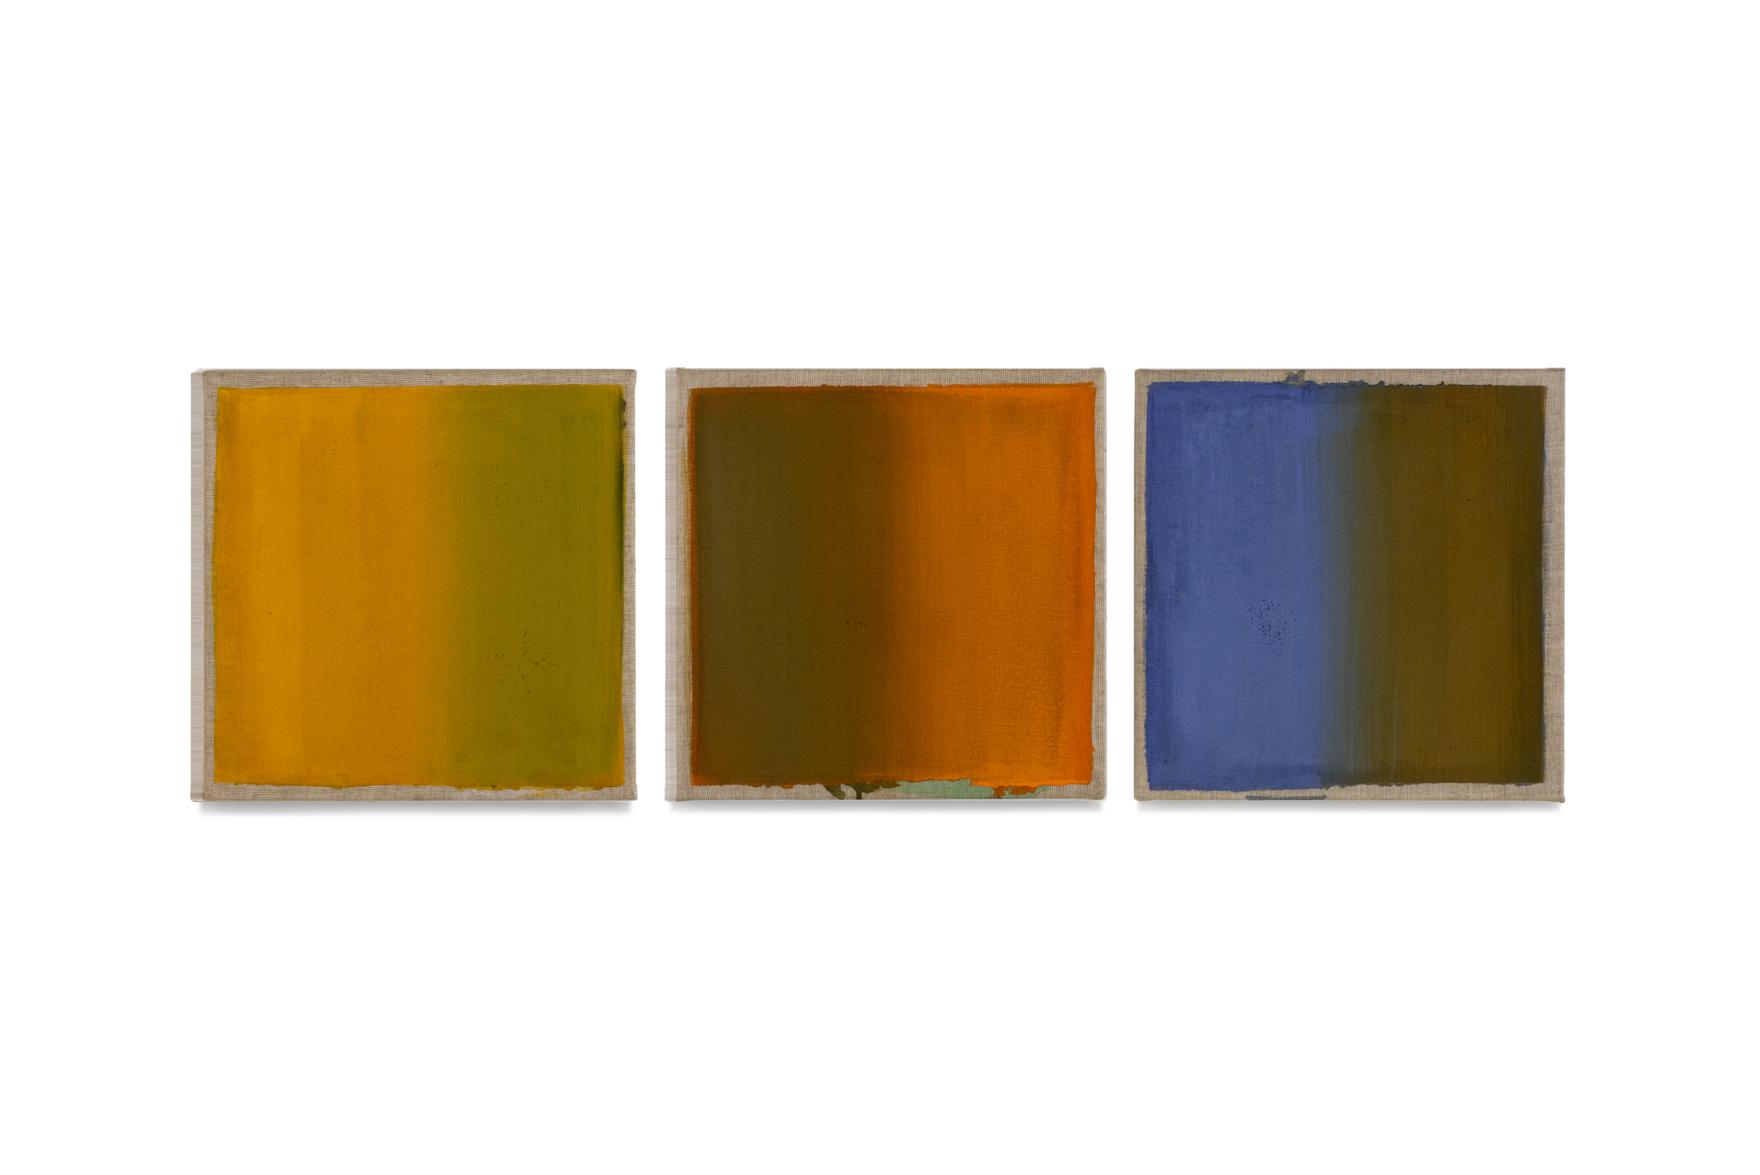 gelb rot blau, 2016, drei Tafeln je 40x40 | giallo rosso blu, 3 tavole cad. 40x40